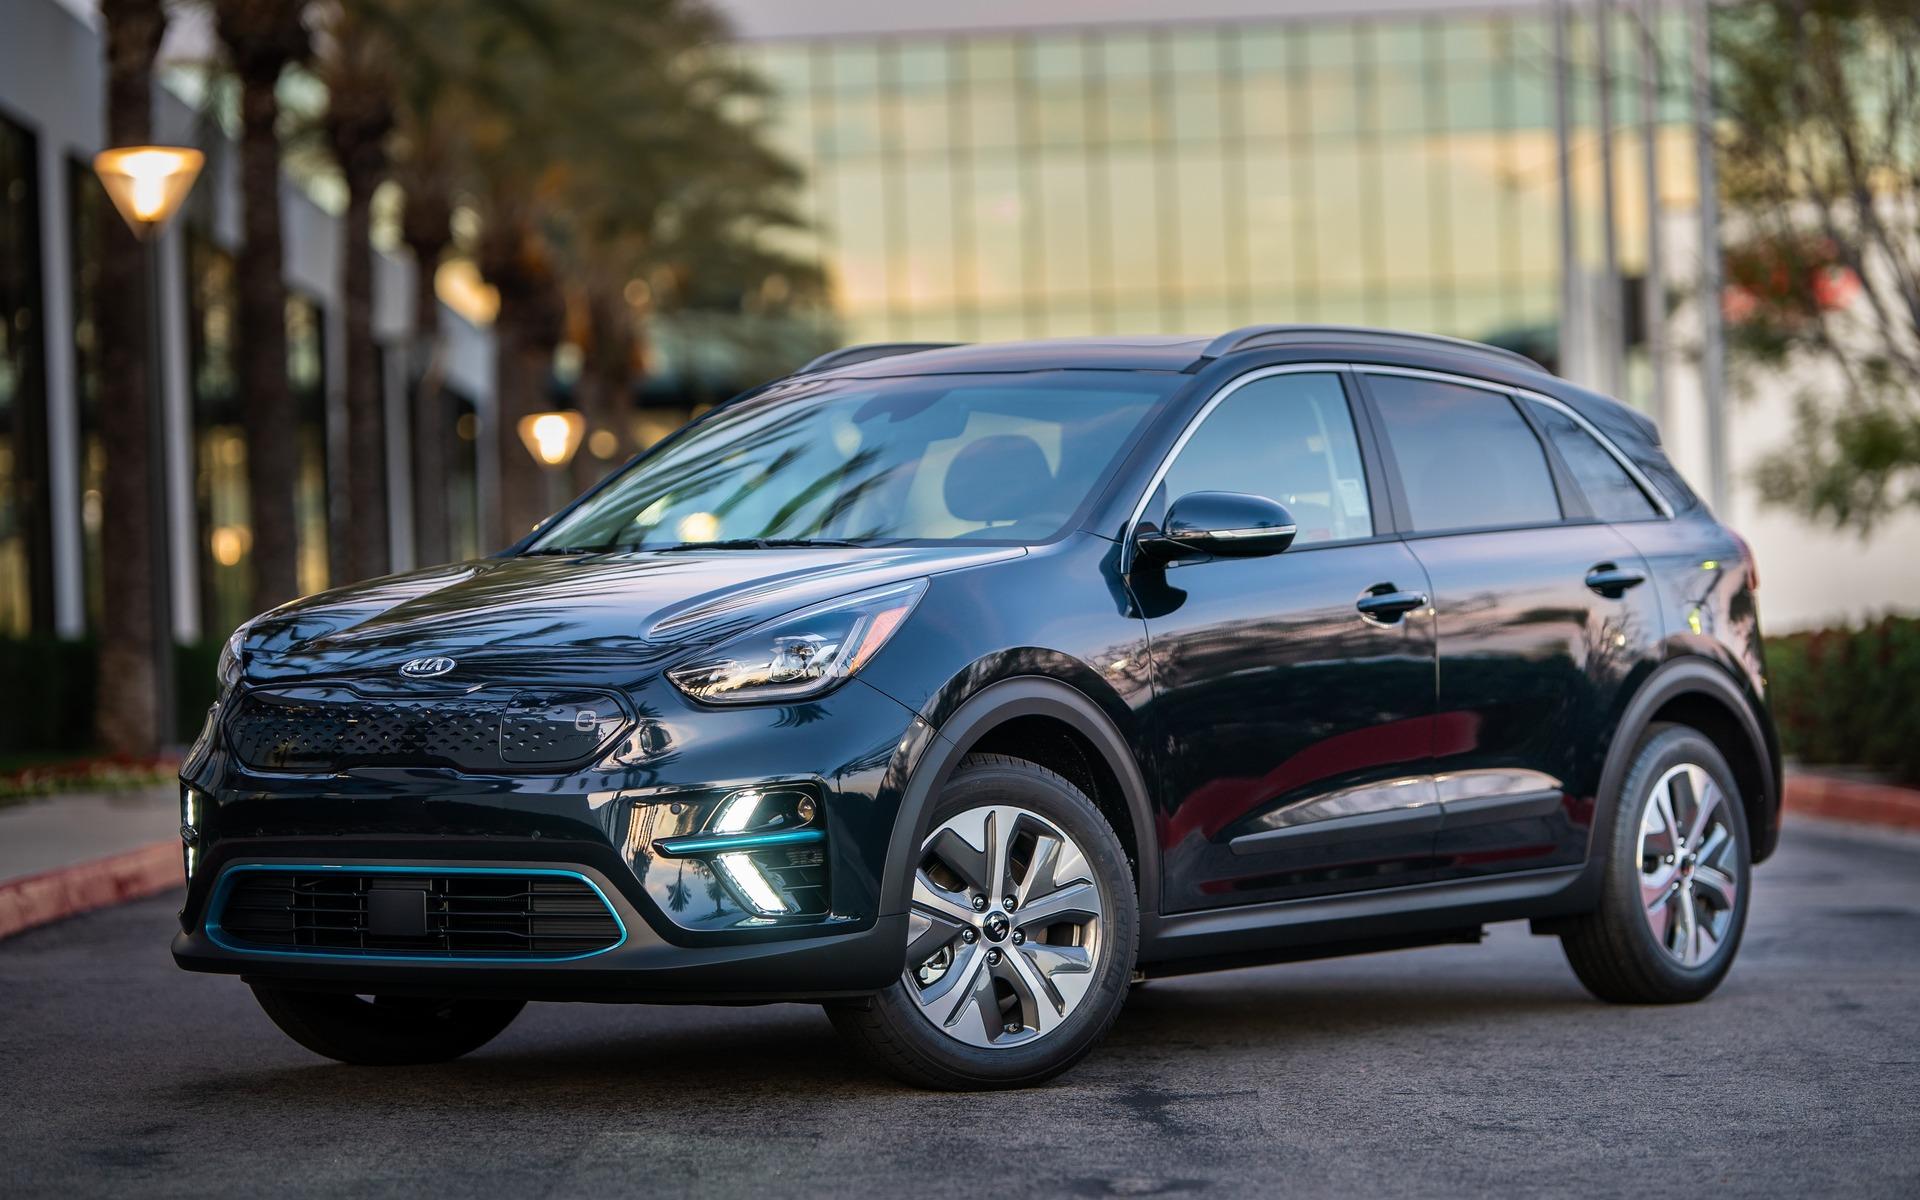 2019 Kia Niro Ev And 2020 Kia Soul Ev Pricing Announced The Car Guide